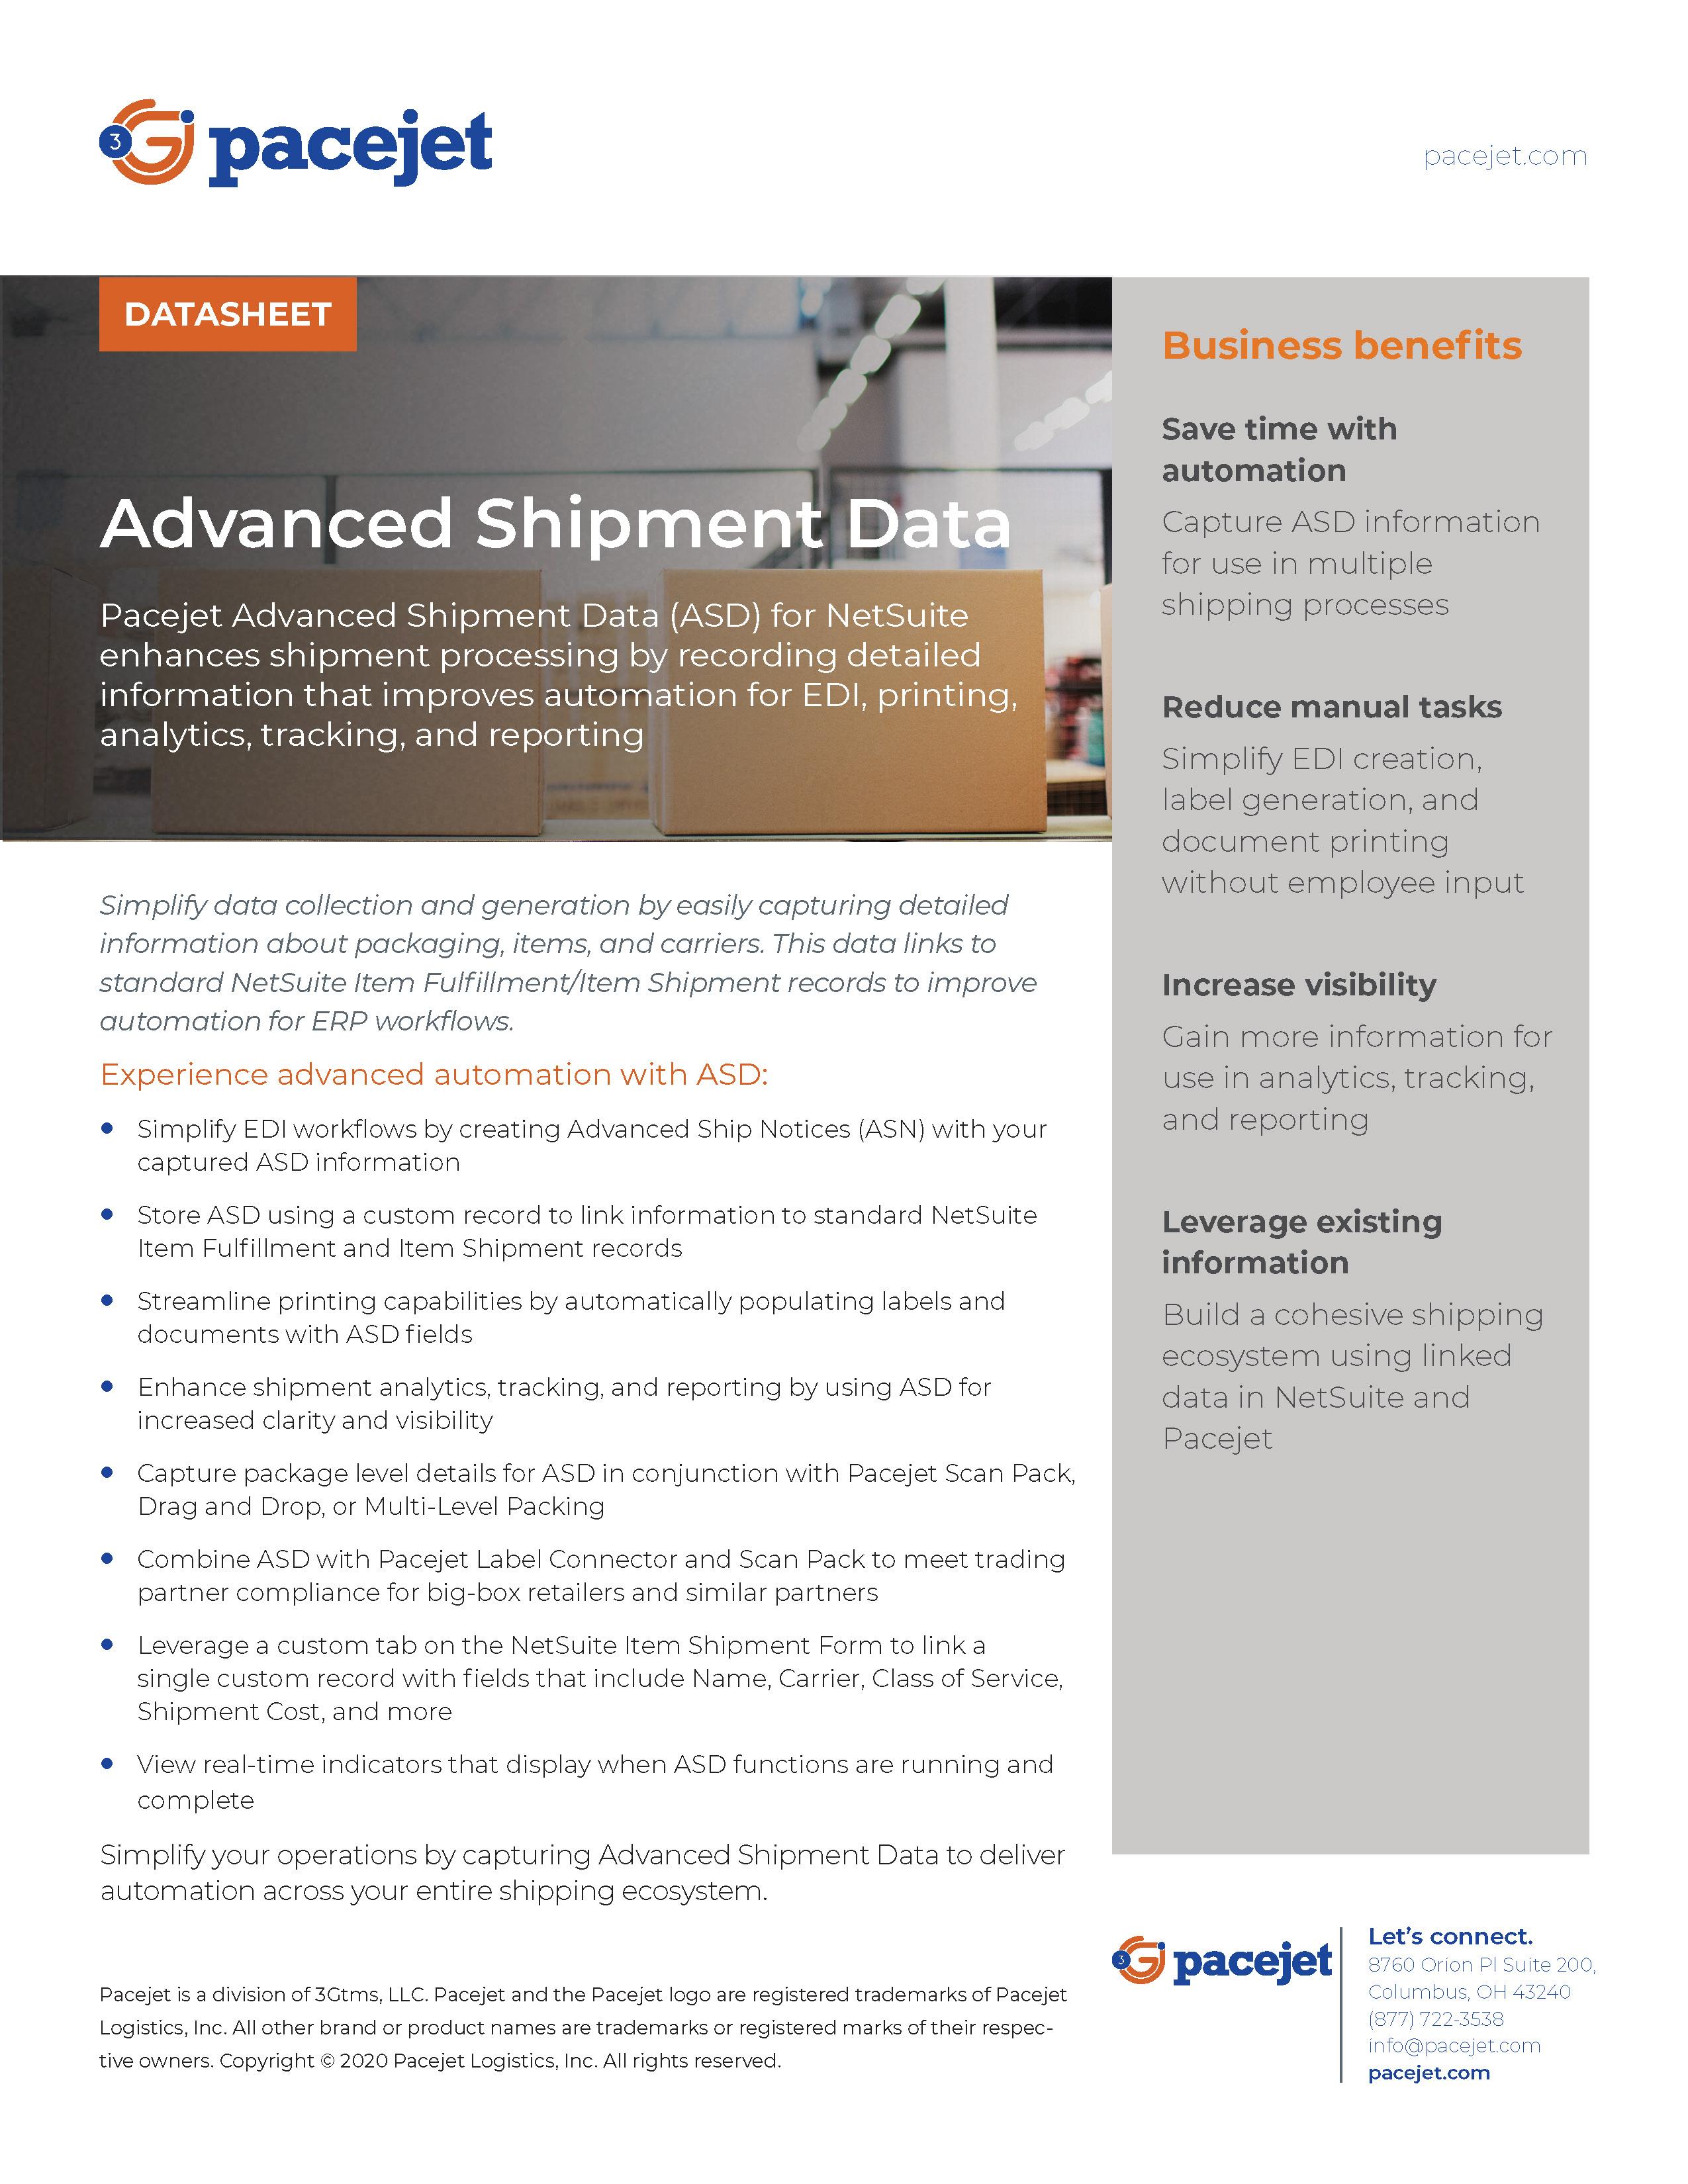 Pacejet_Advanced_Shipment_Data_datasheet